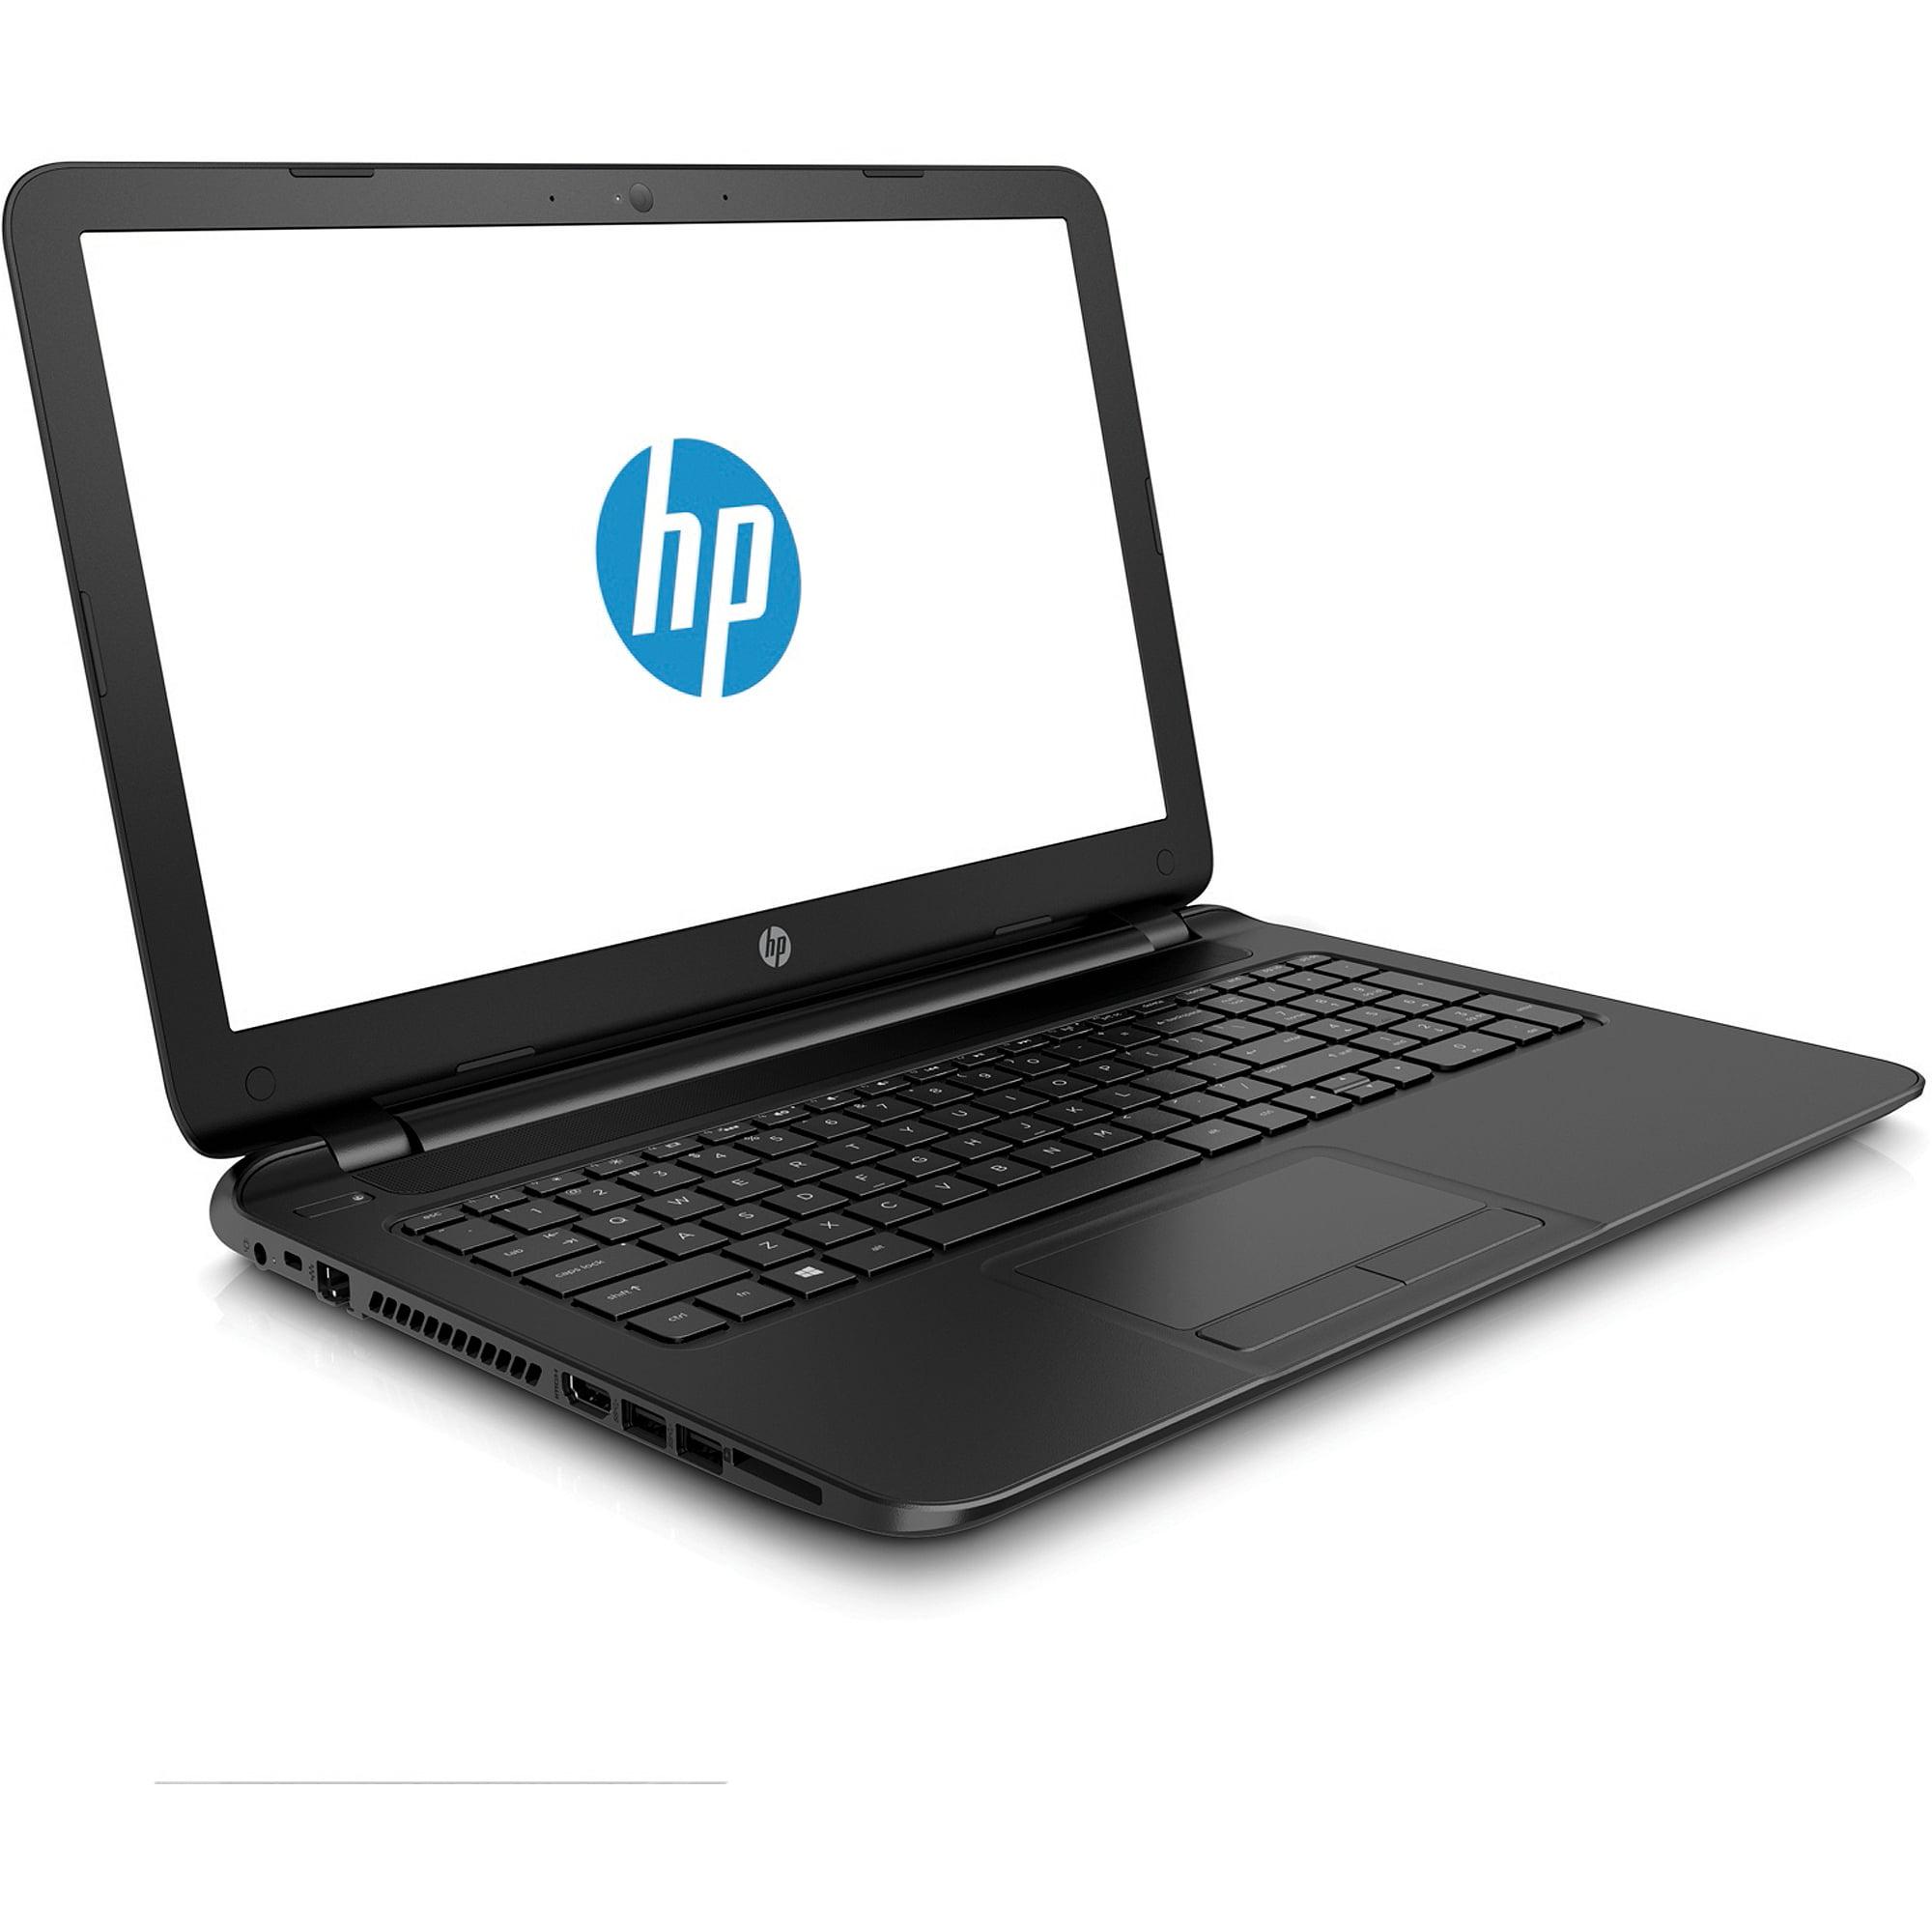 "HP 15.6"" 15-F039WM Laptop PC with Intel Celeron N2830 Processor, 4GB Memory, 500GB Hard Drive and Windows 8.1, Black"